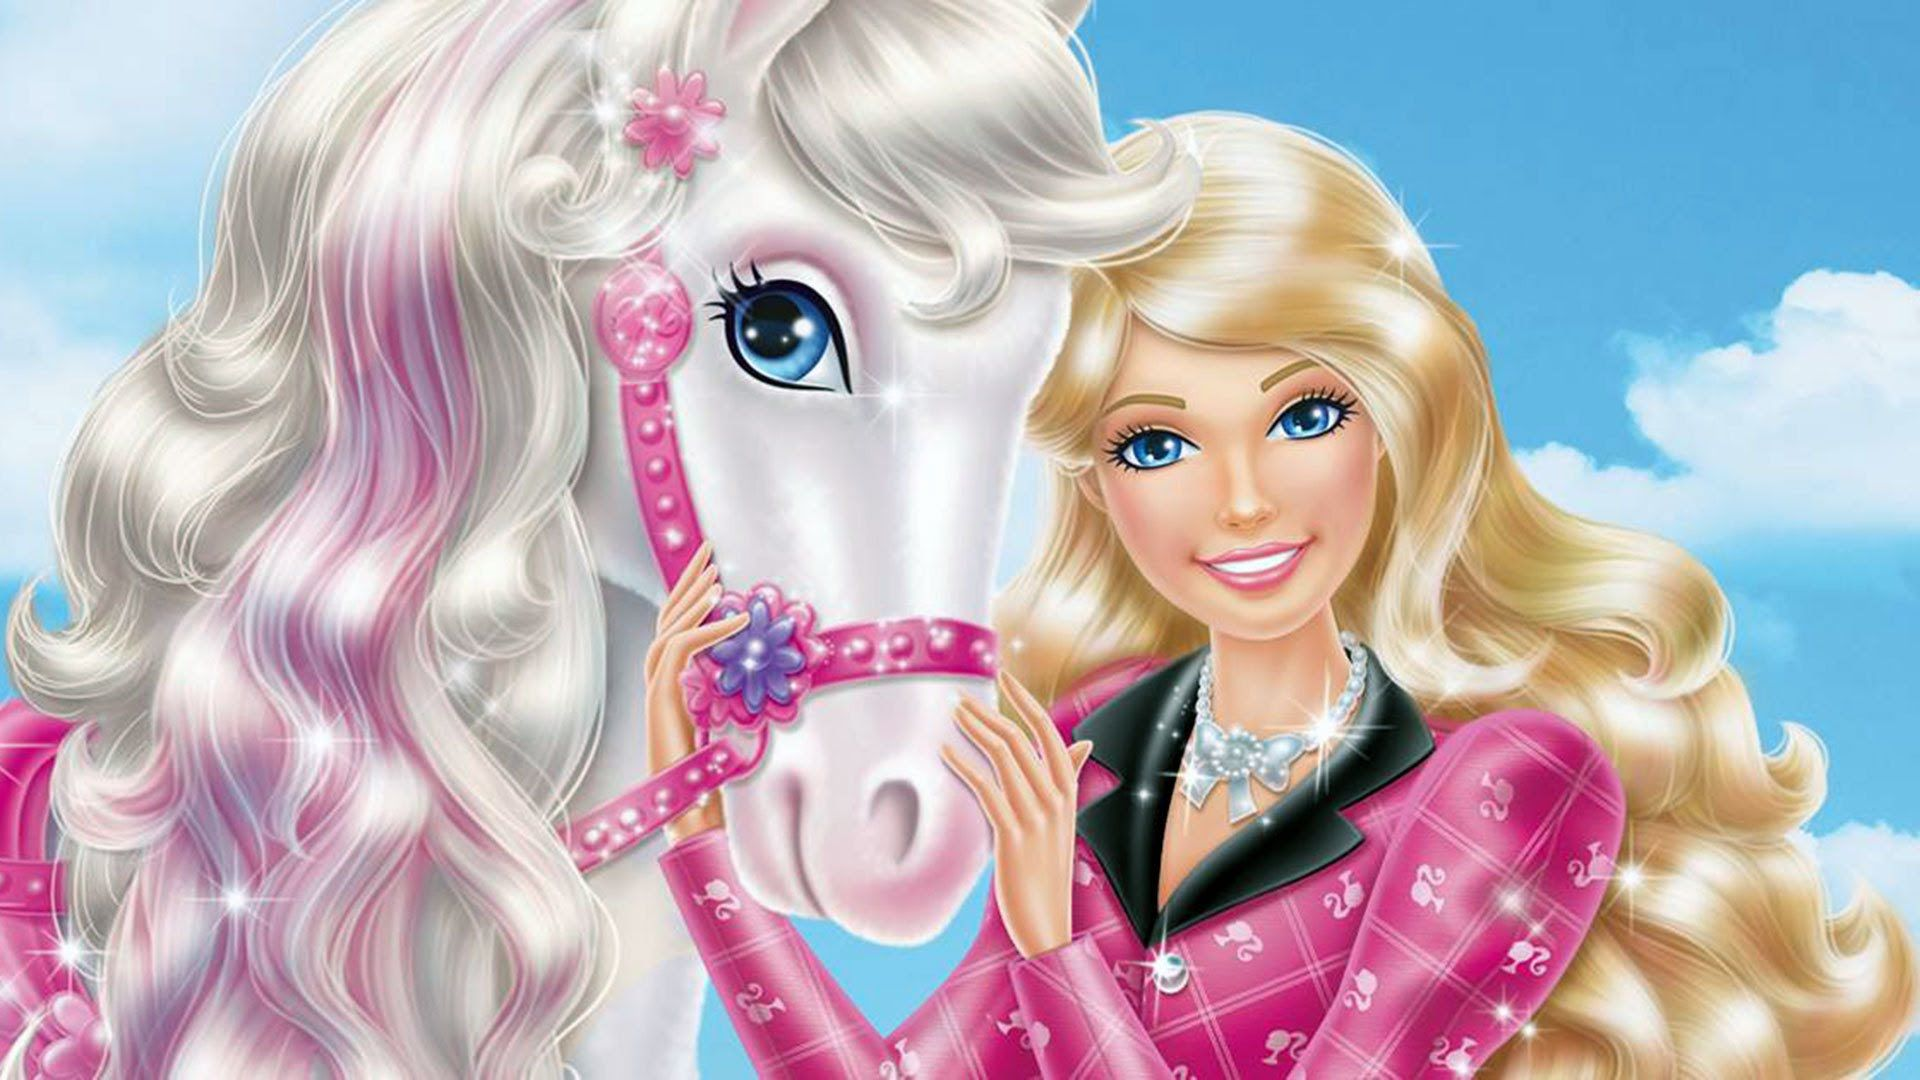 New Barbie Movies full Movie in English ☆ Barbie full Episodes ☆ Disney ...